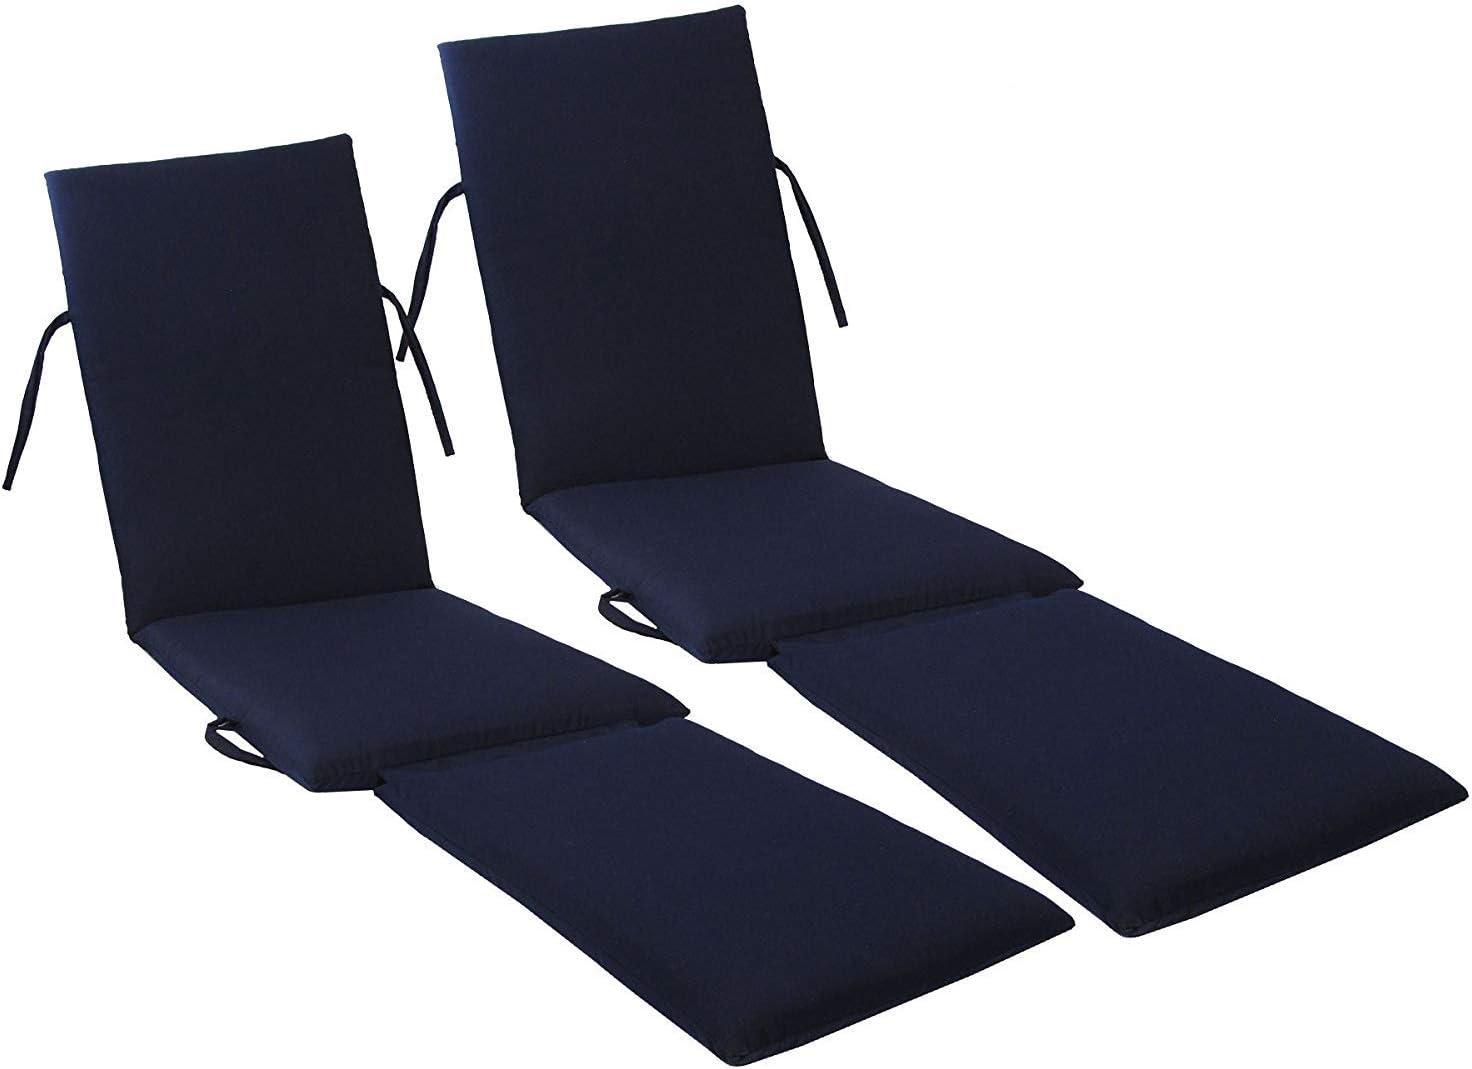 kingrattan.com Made in Detroit Mall USA Steamer Canva Sunbrella Chair Cushion Indianapolis Mall